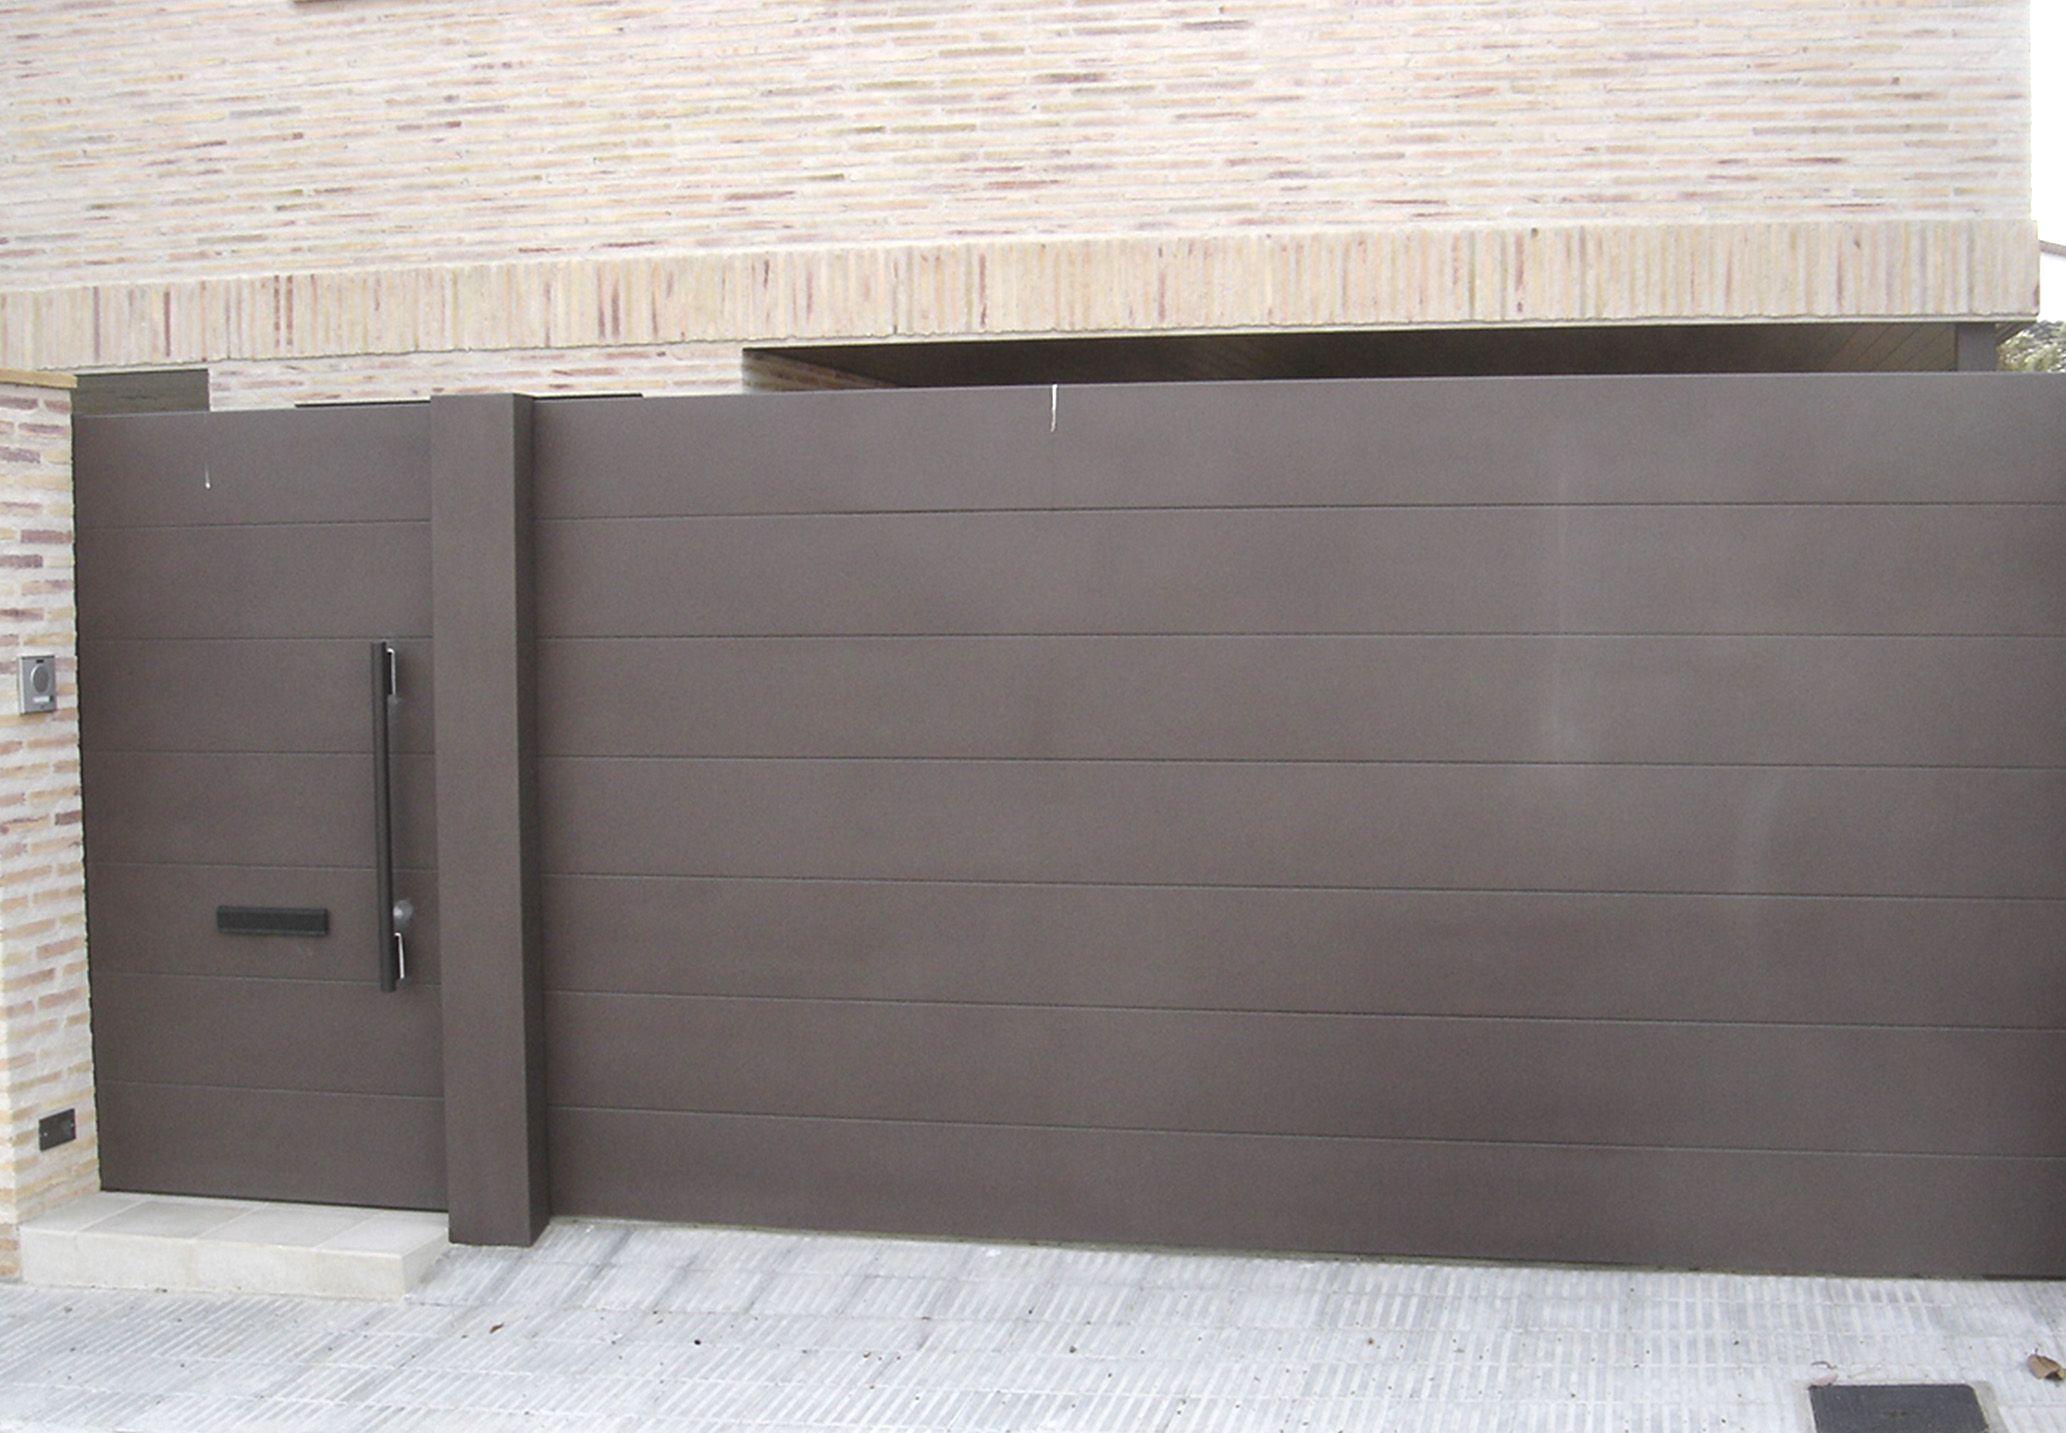 Puerta valla dise o buscar con google vallados for Puertas corredizas metalicas